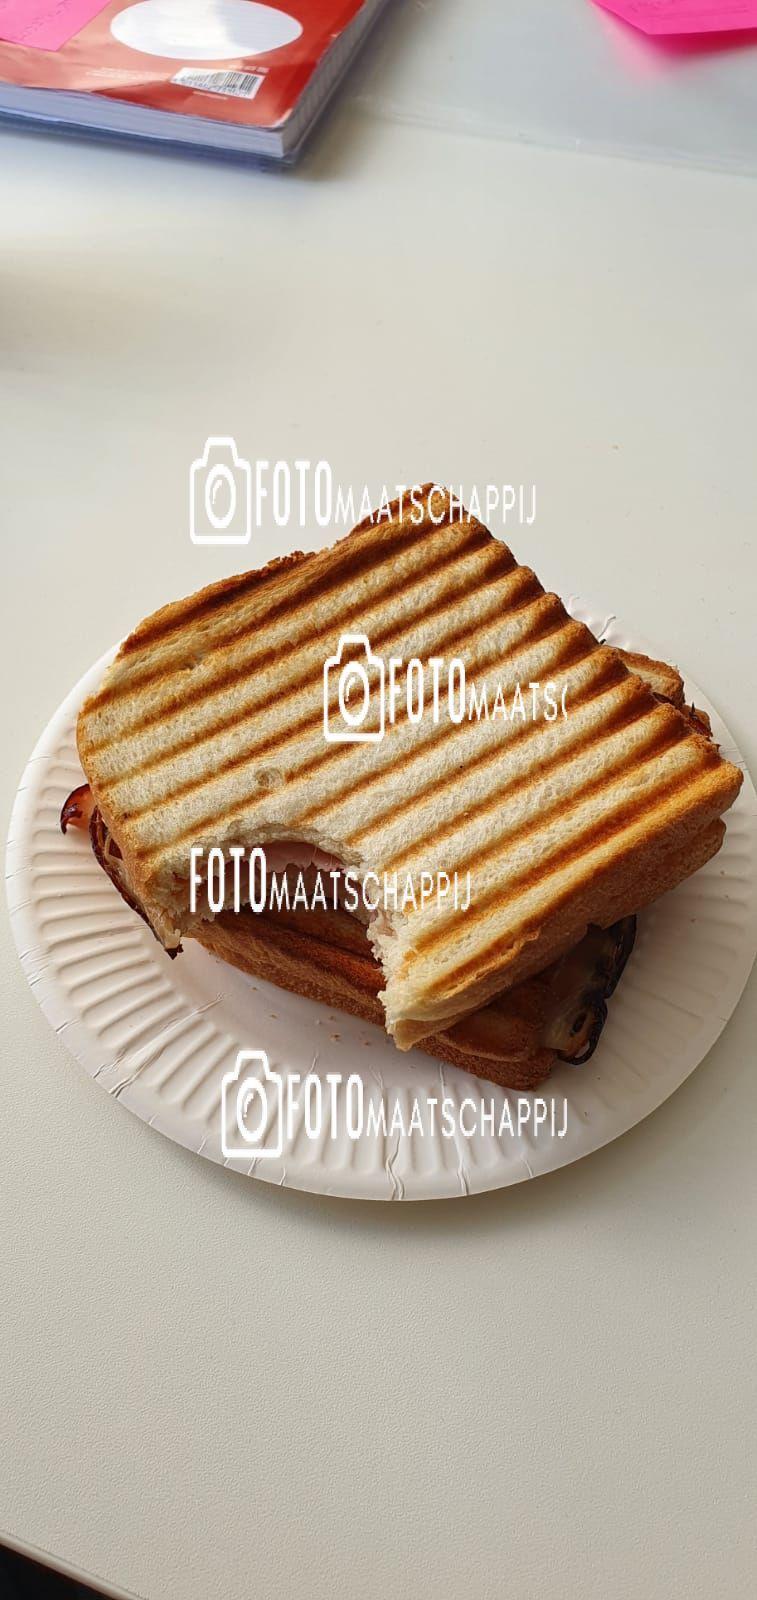 tosti